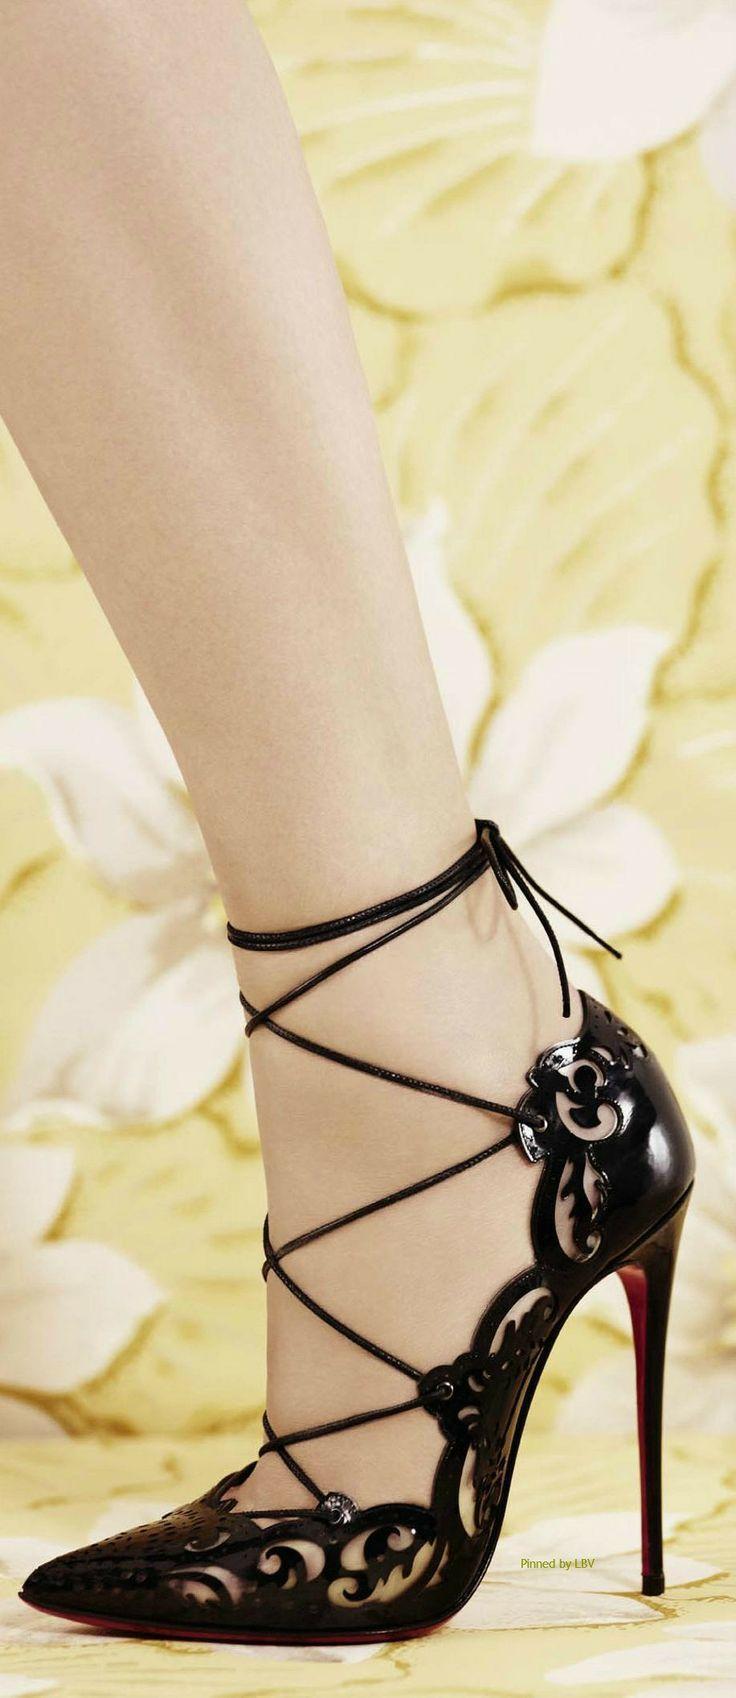 Christian Louboutin Black Lace-Up Sandal Spring 2014 - Style Estate -